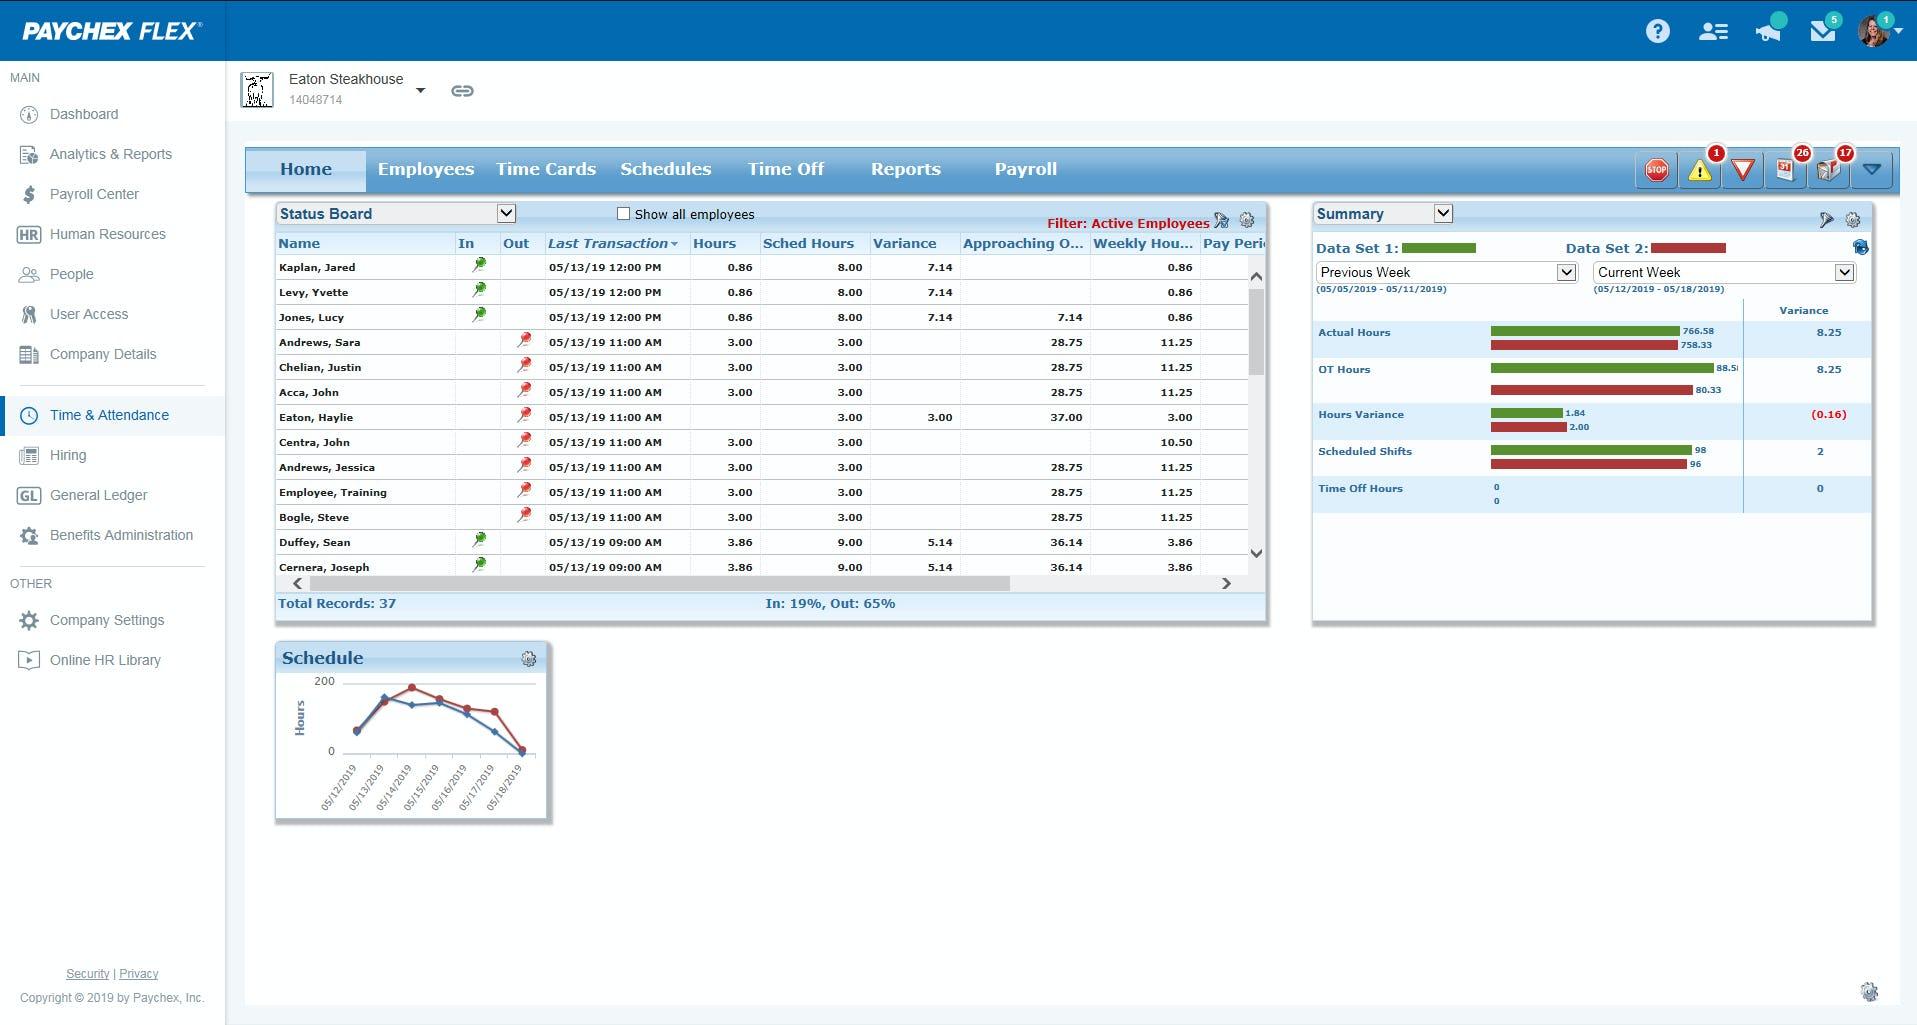 Paychex Flex Software - Paychex TAA